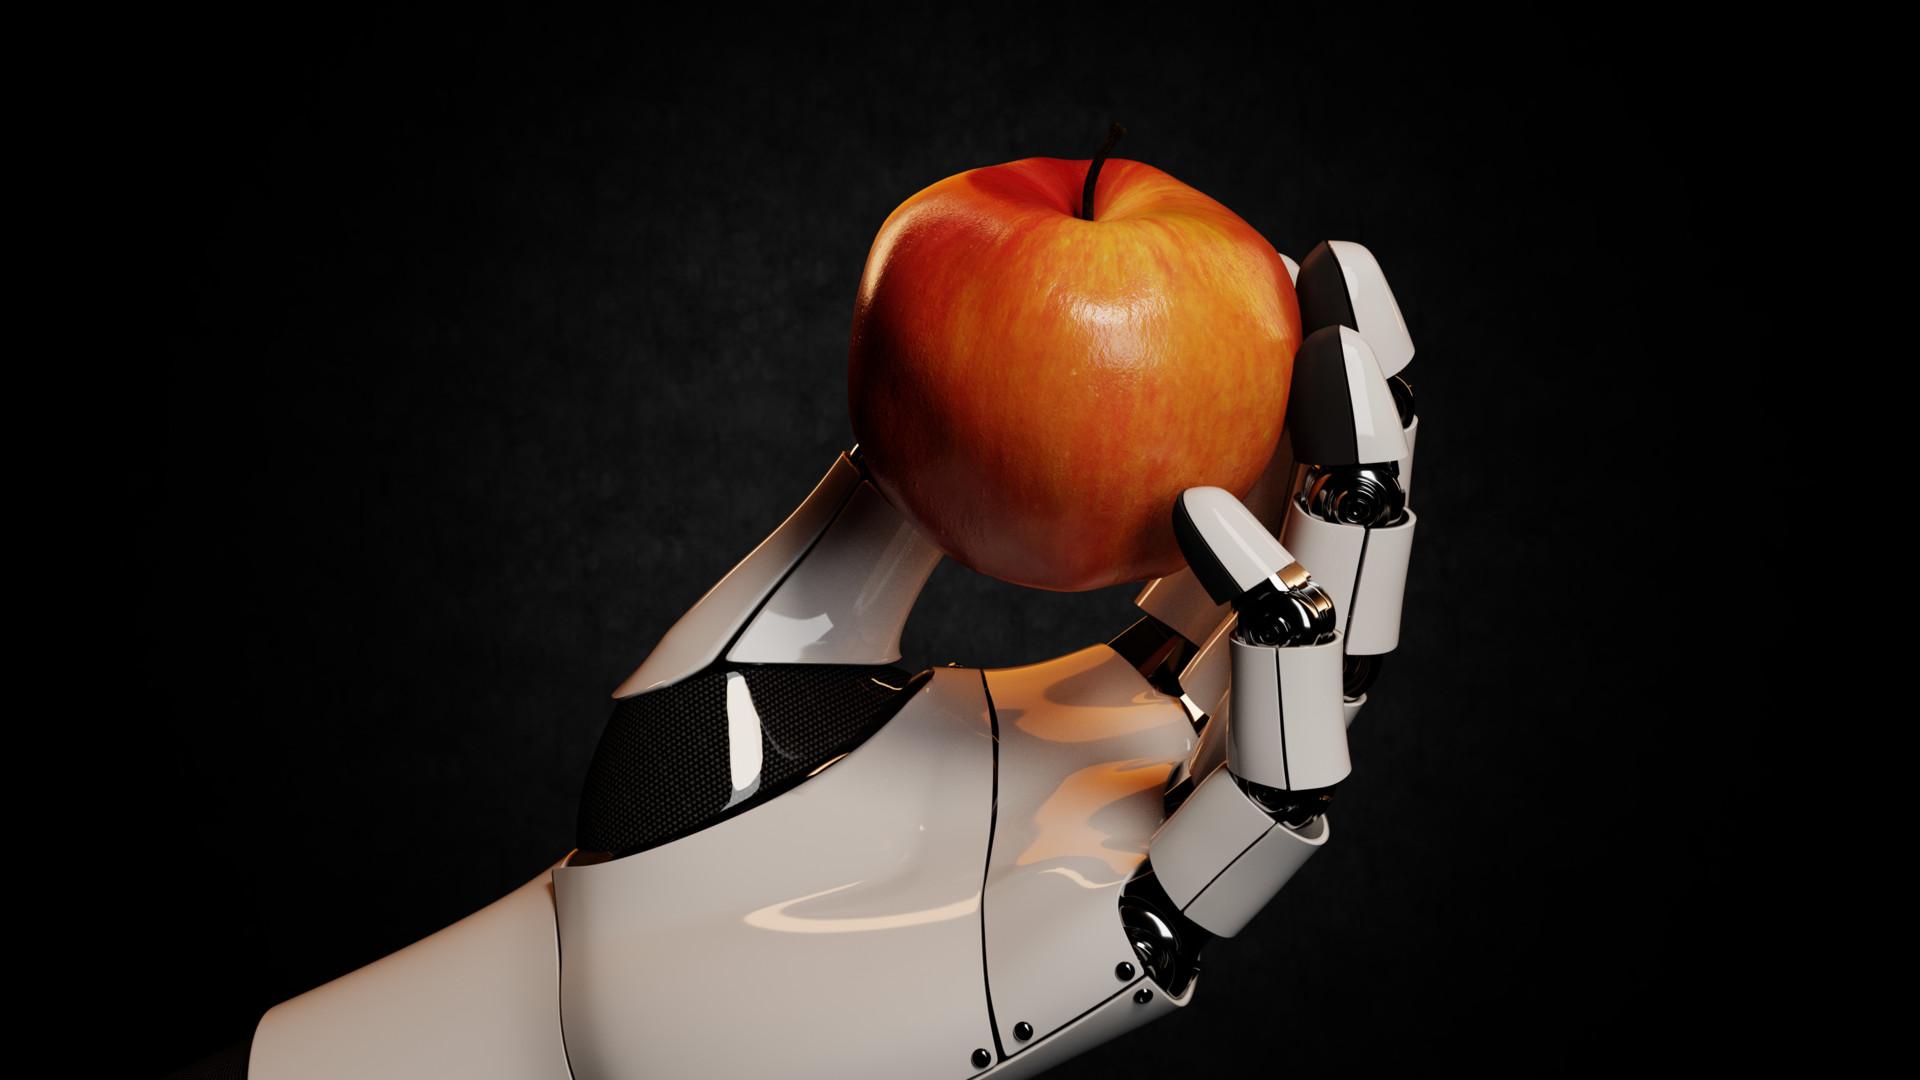 Prashan s robotic hand 2